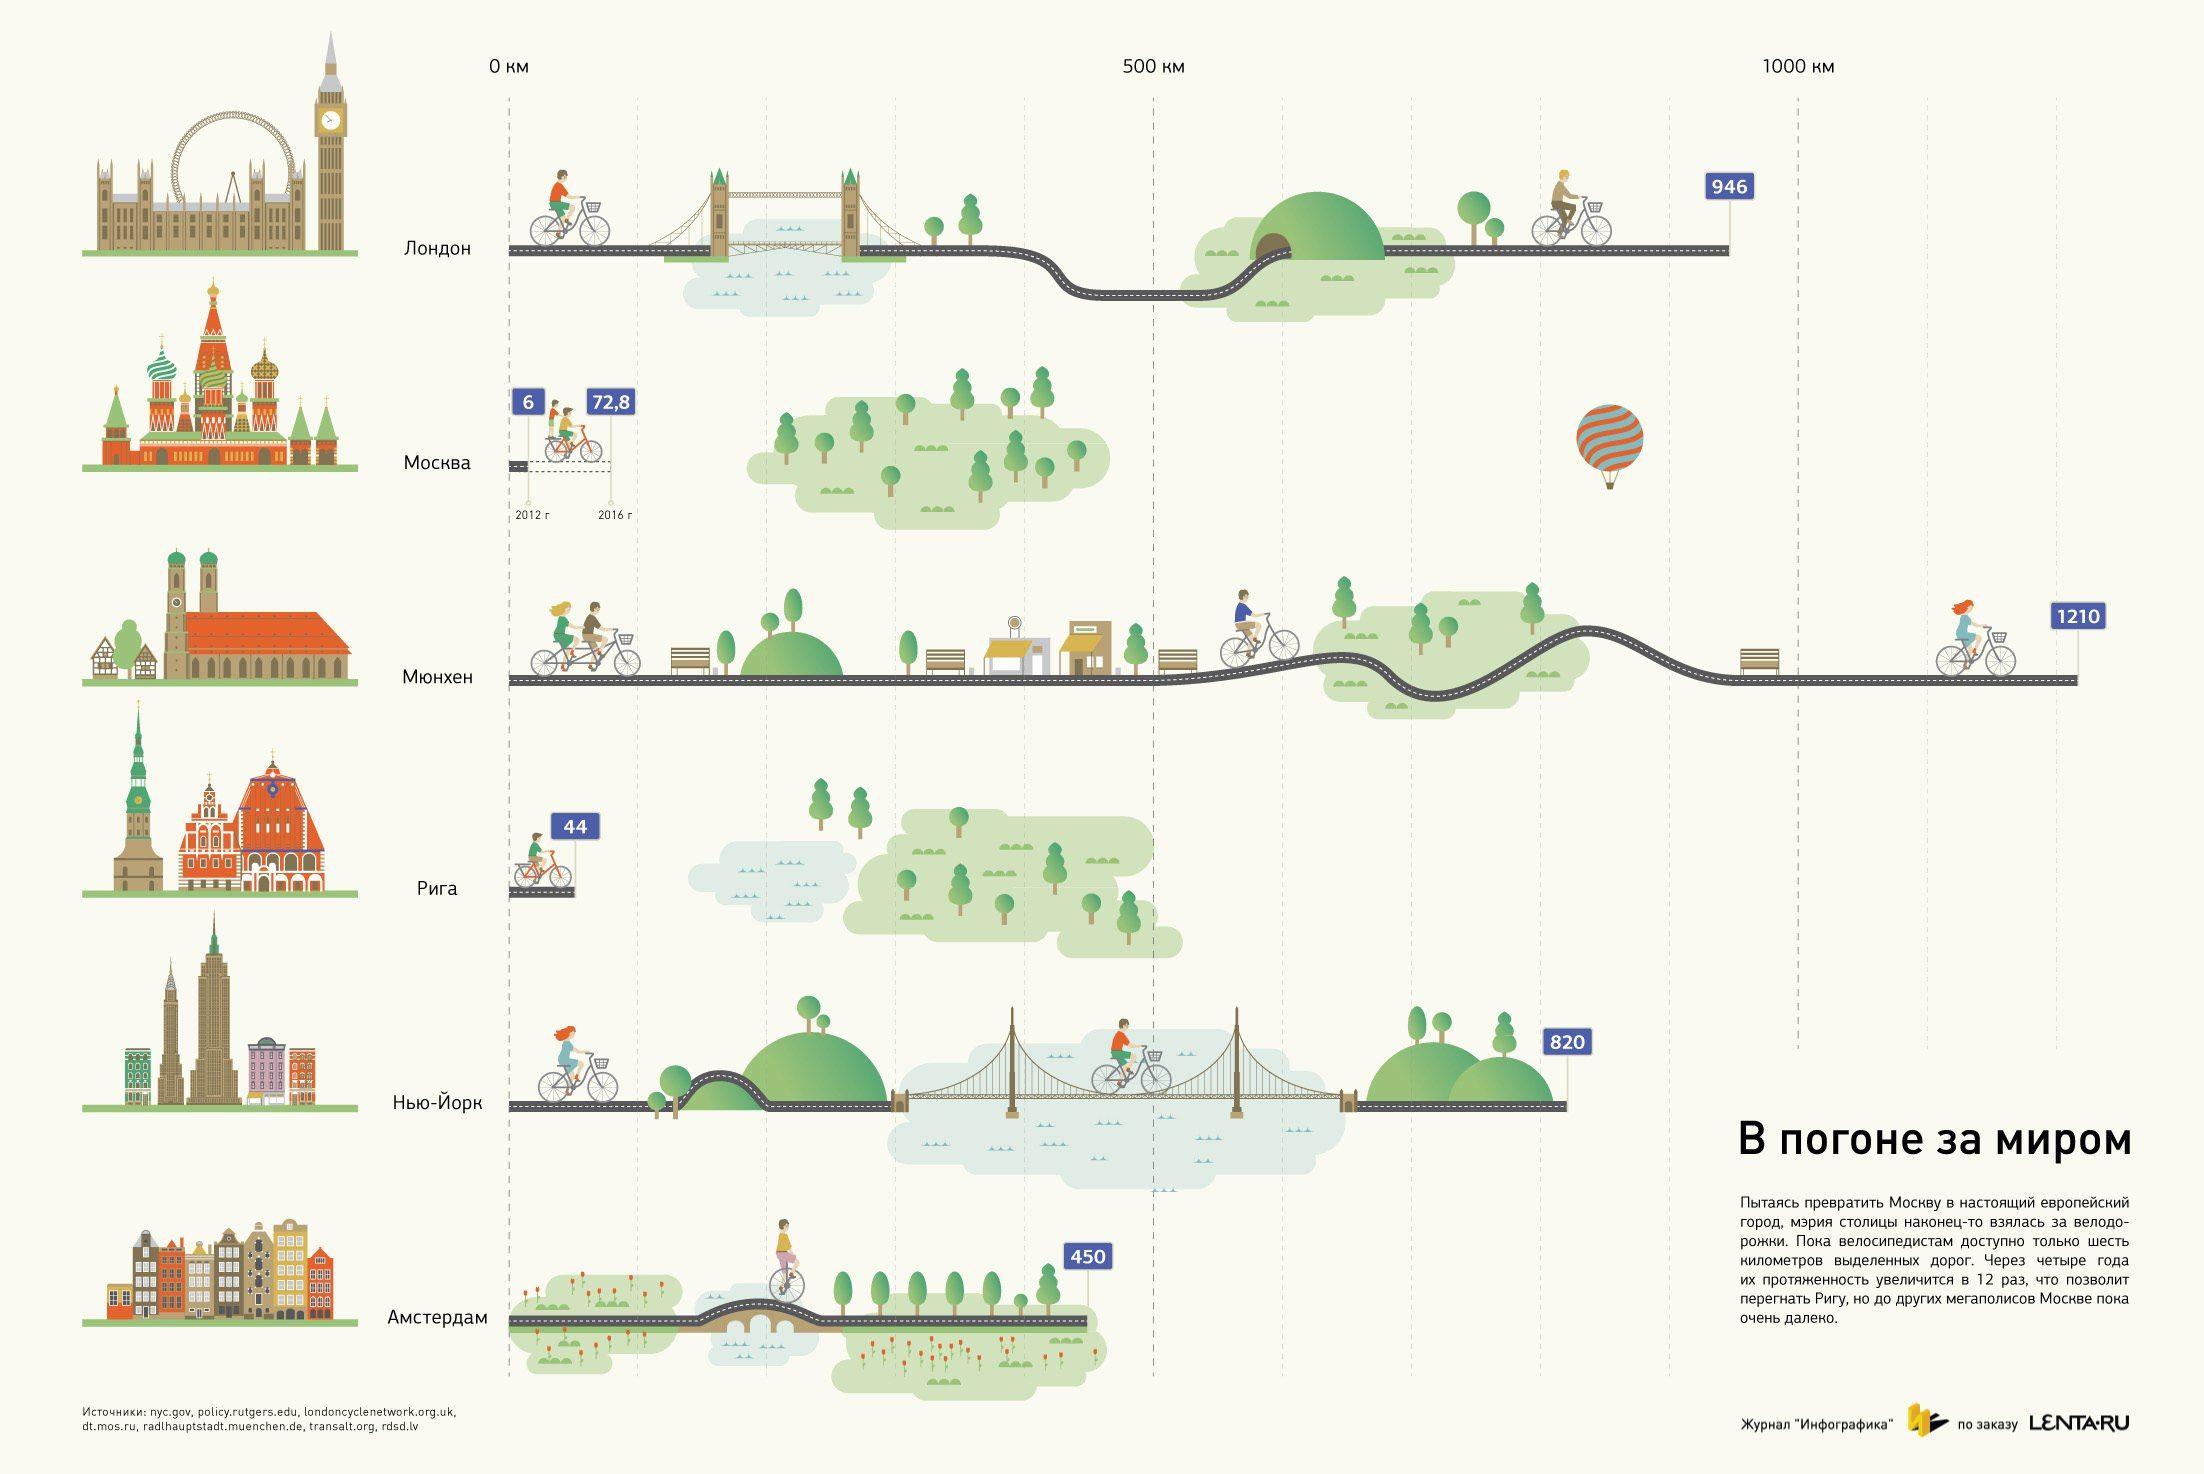 Инфографика: в погоне за миром